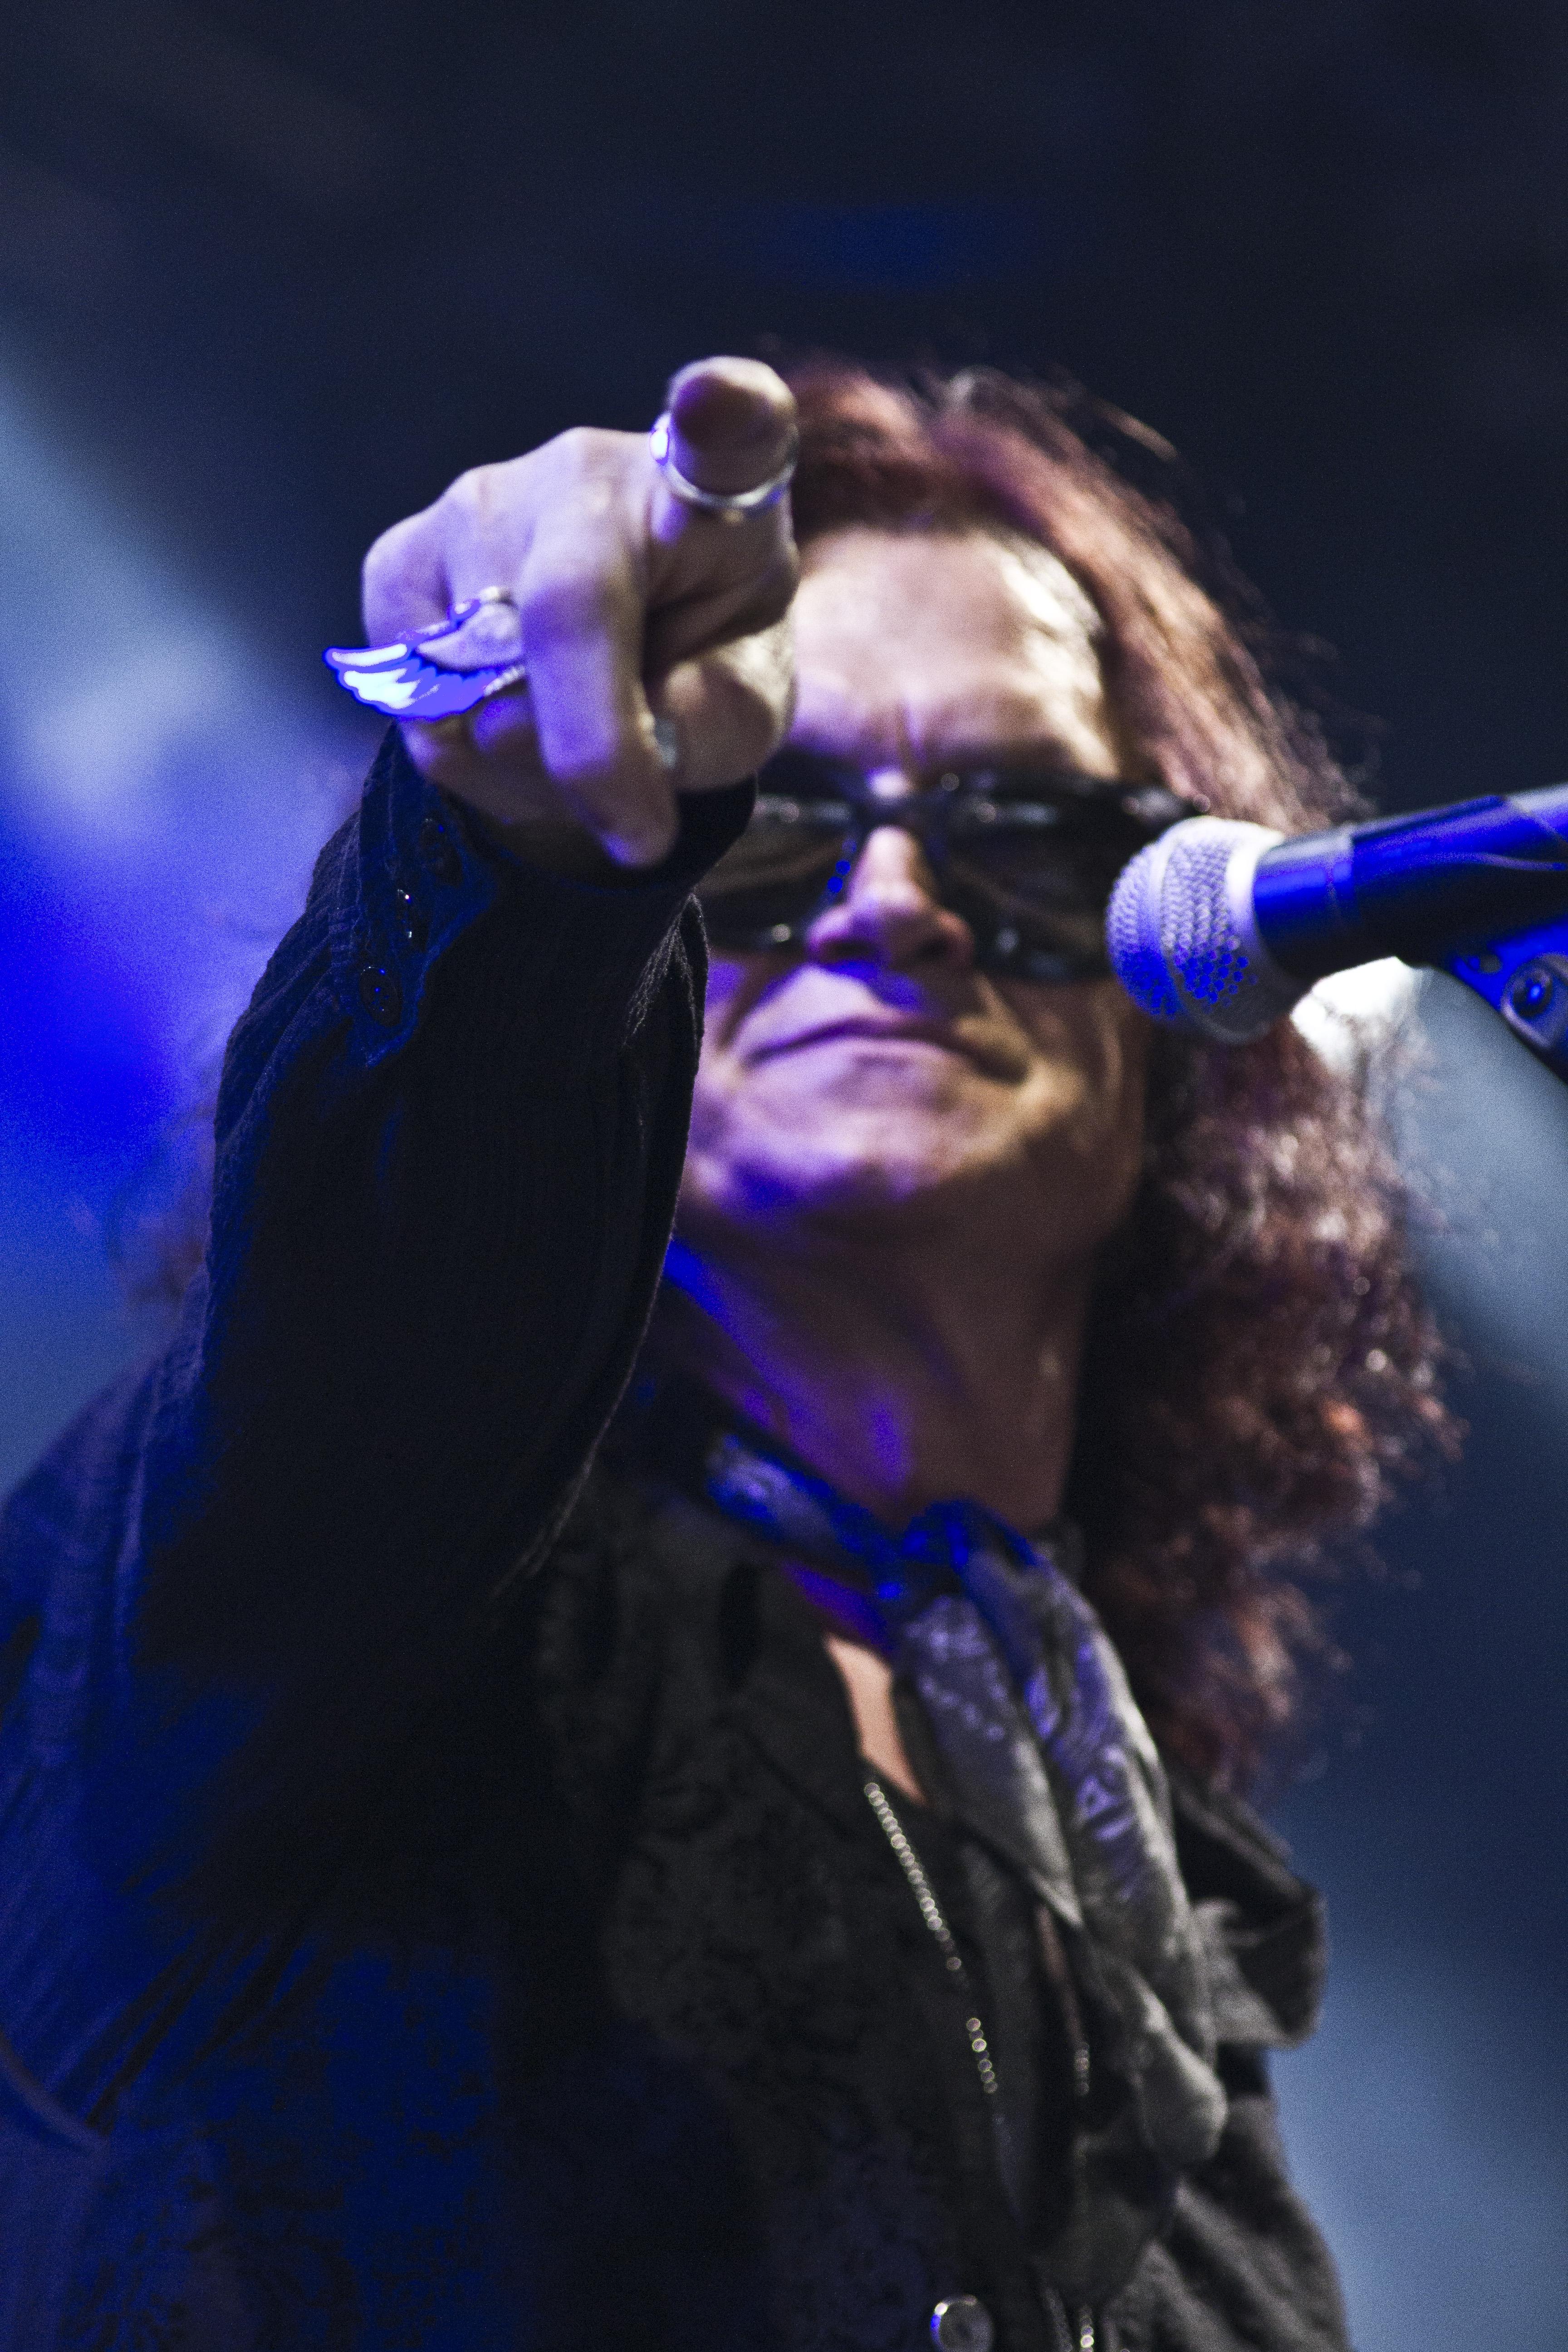 Festival Guitare En Scène : Scorpions, Glenn Hughes, Yes, L.E.J., Amy Macdonald, Extreme…